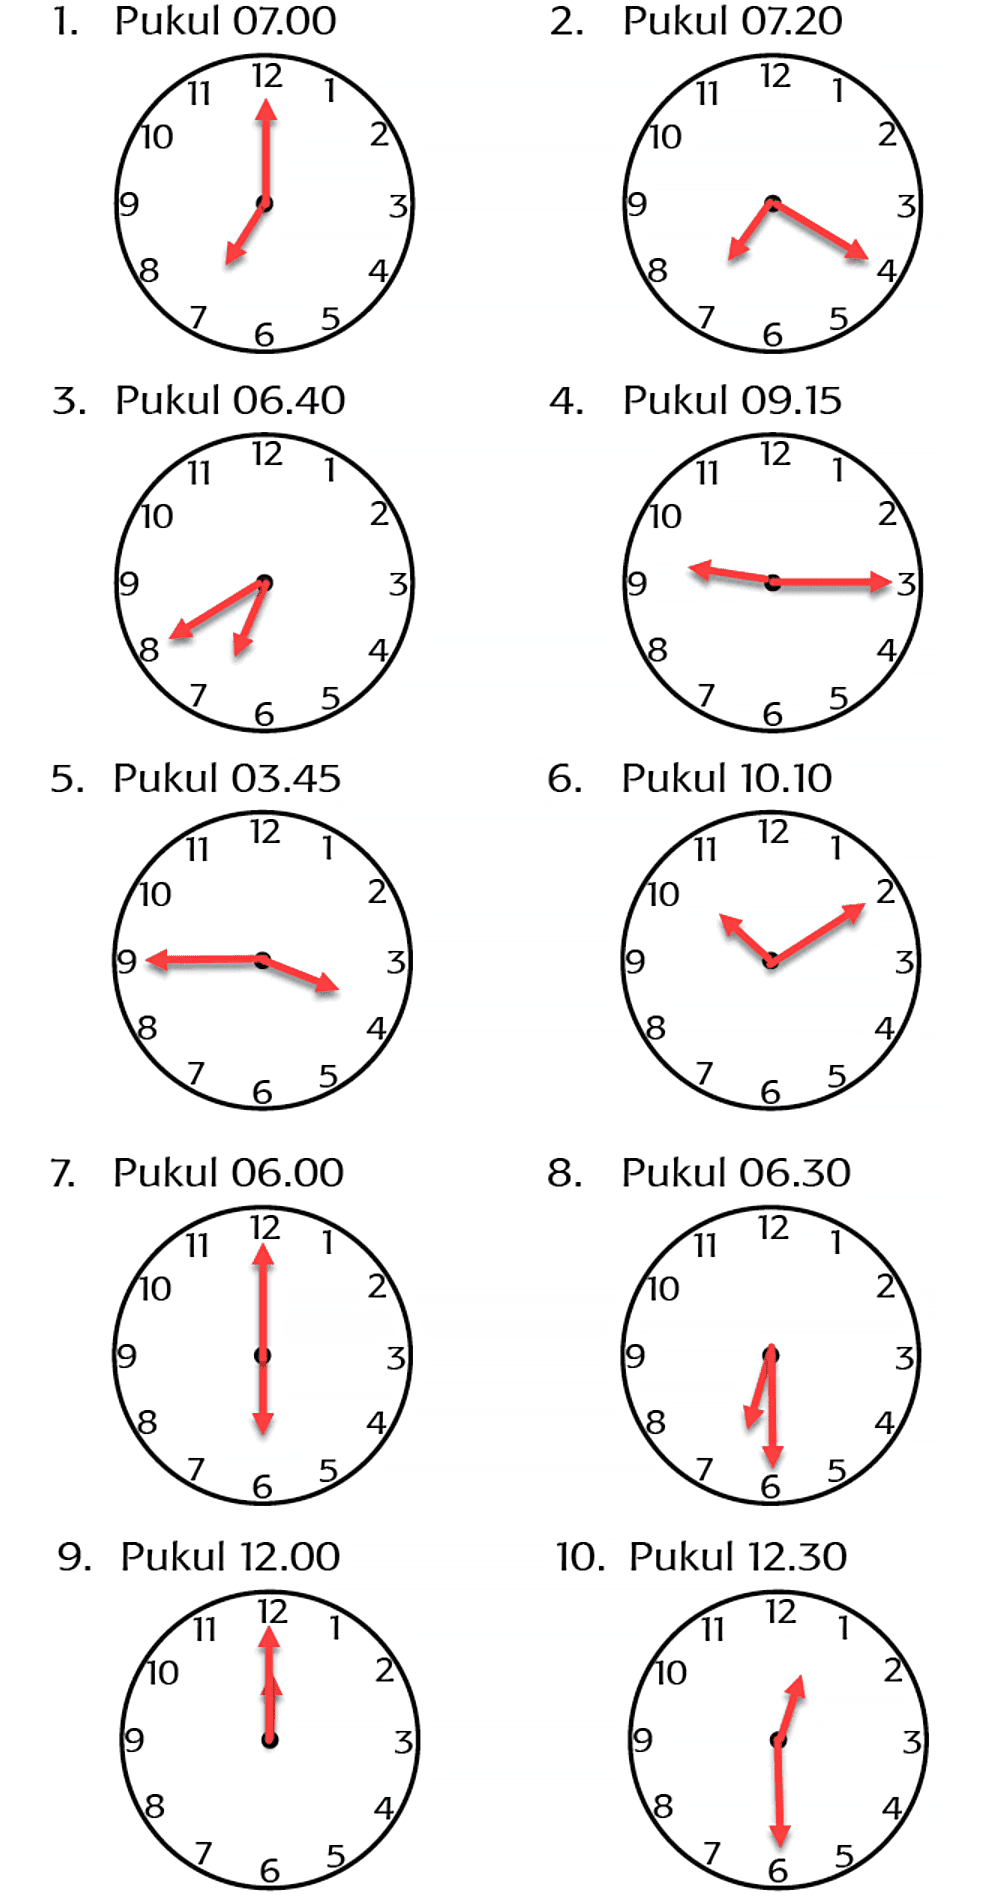 Kunci Jawaban Halaman 41, 42, 44, 45, 47 Tema 6 Kelas 3